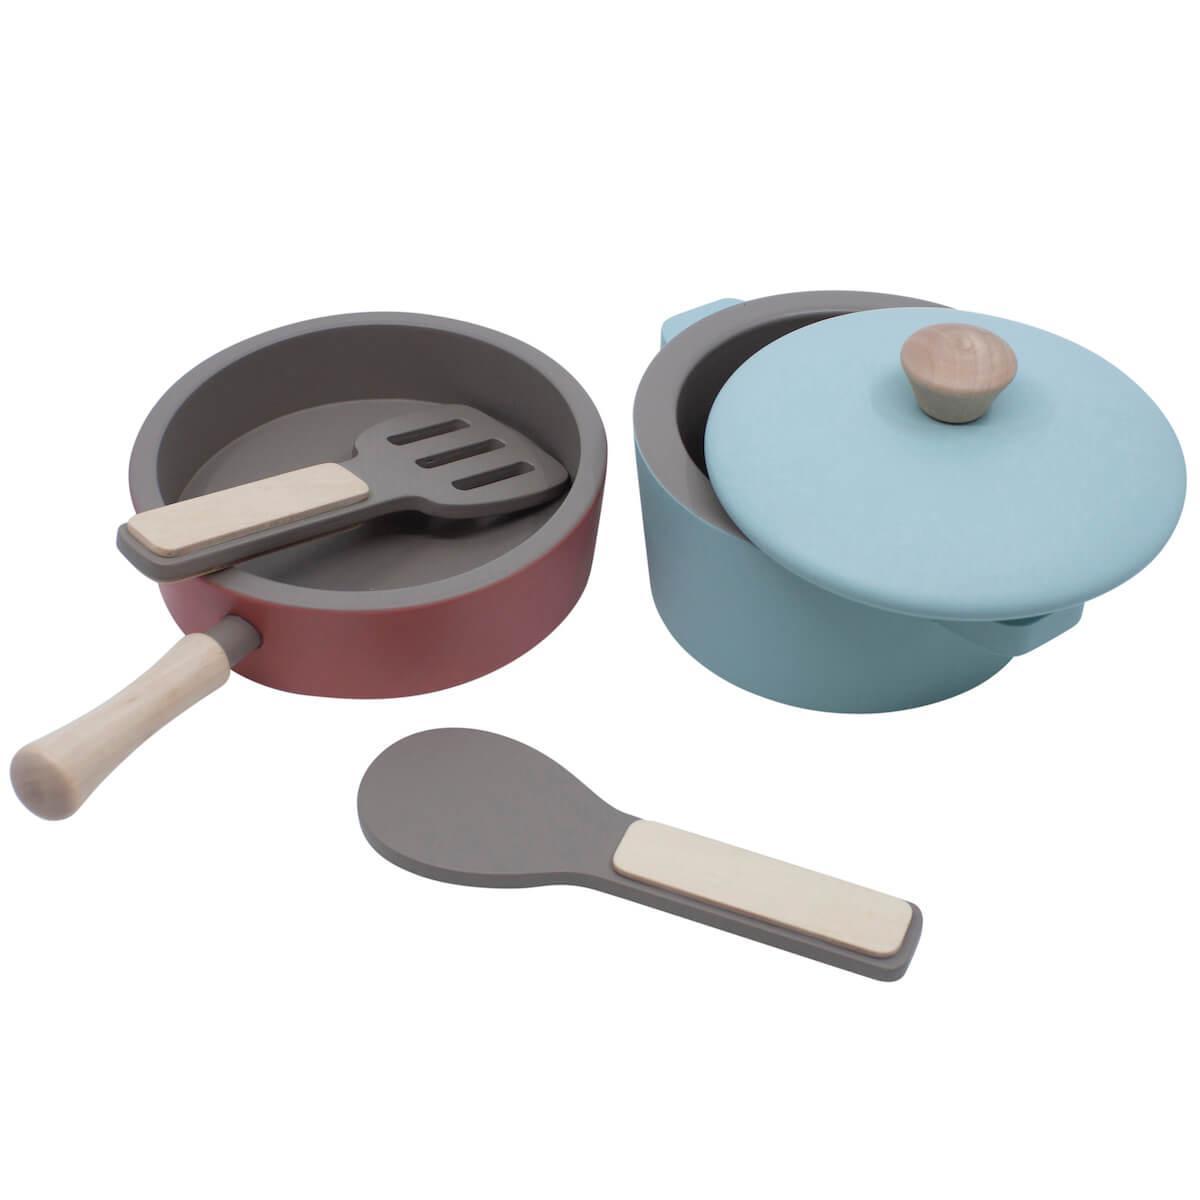 Set ustensiles cuisine Sebra gris warm